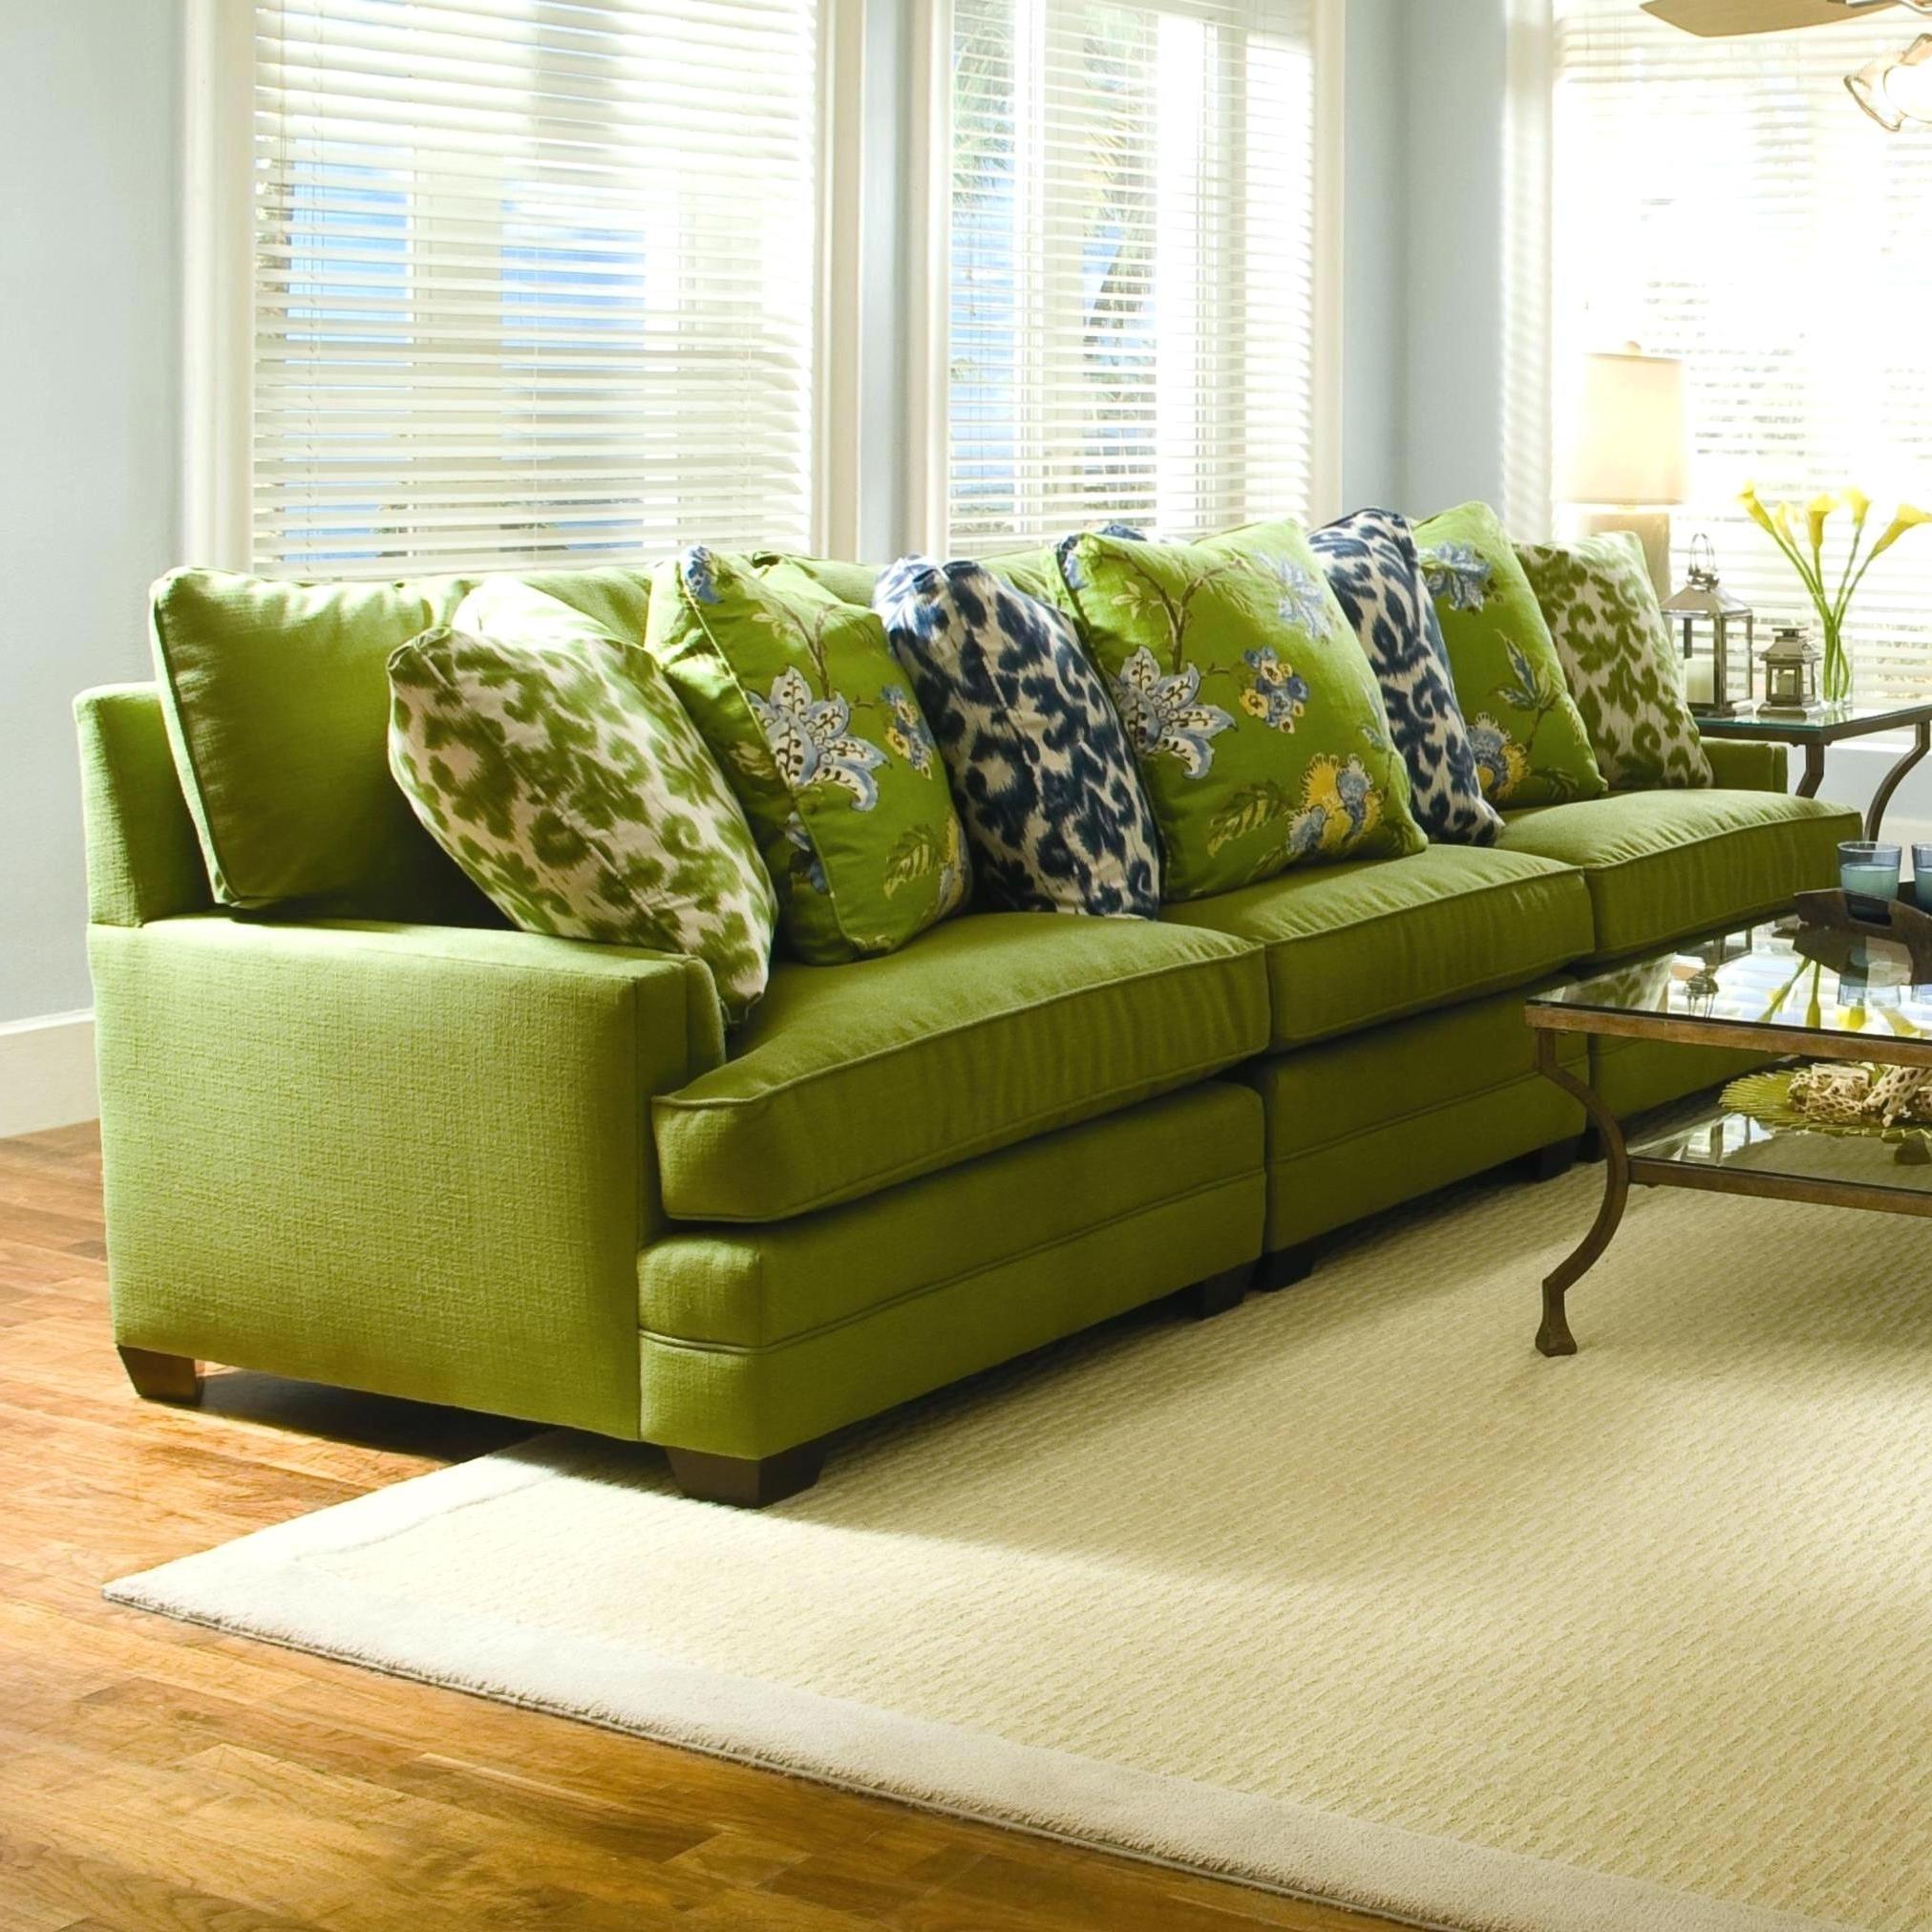 Sam Levitz Sectional Sofas Inside Best And Newest Sams Leather Sofa – Wojcicki (View 4 of 15)